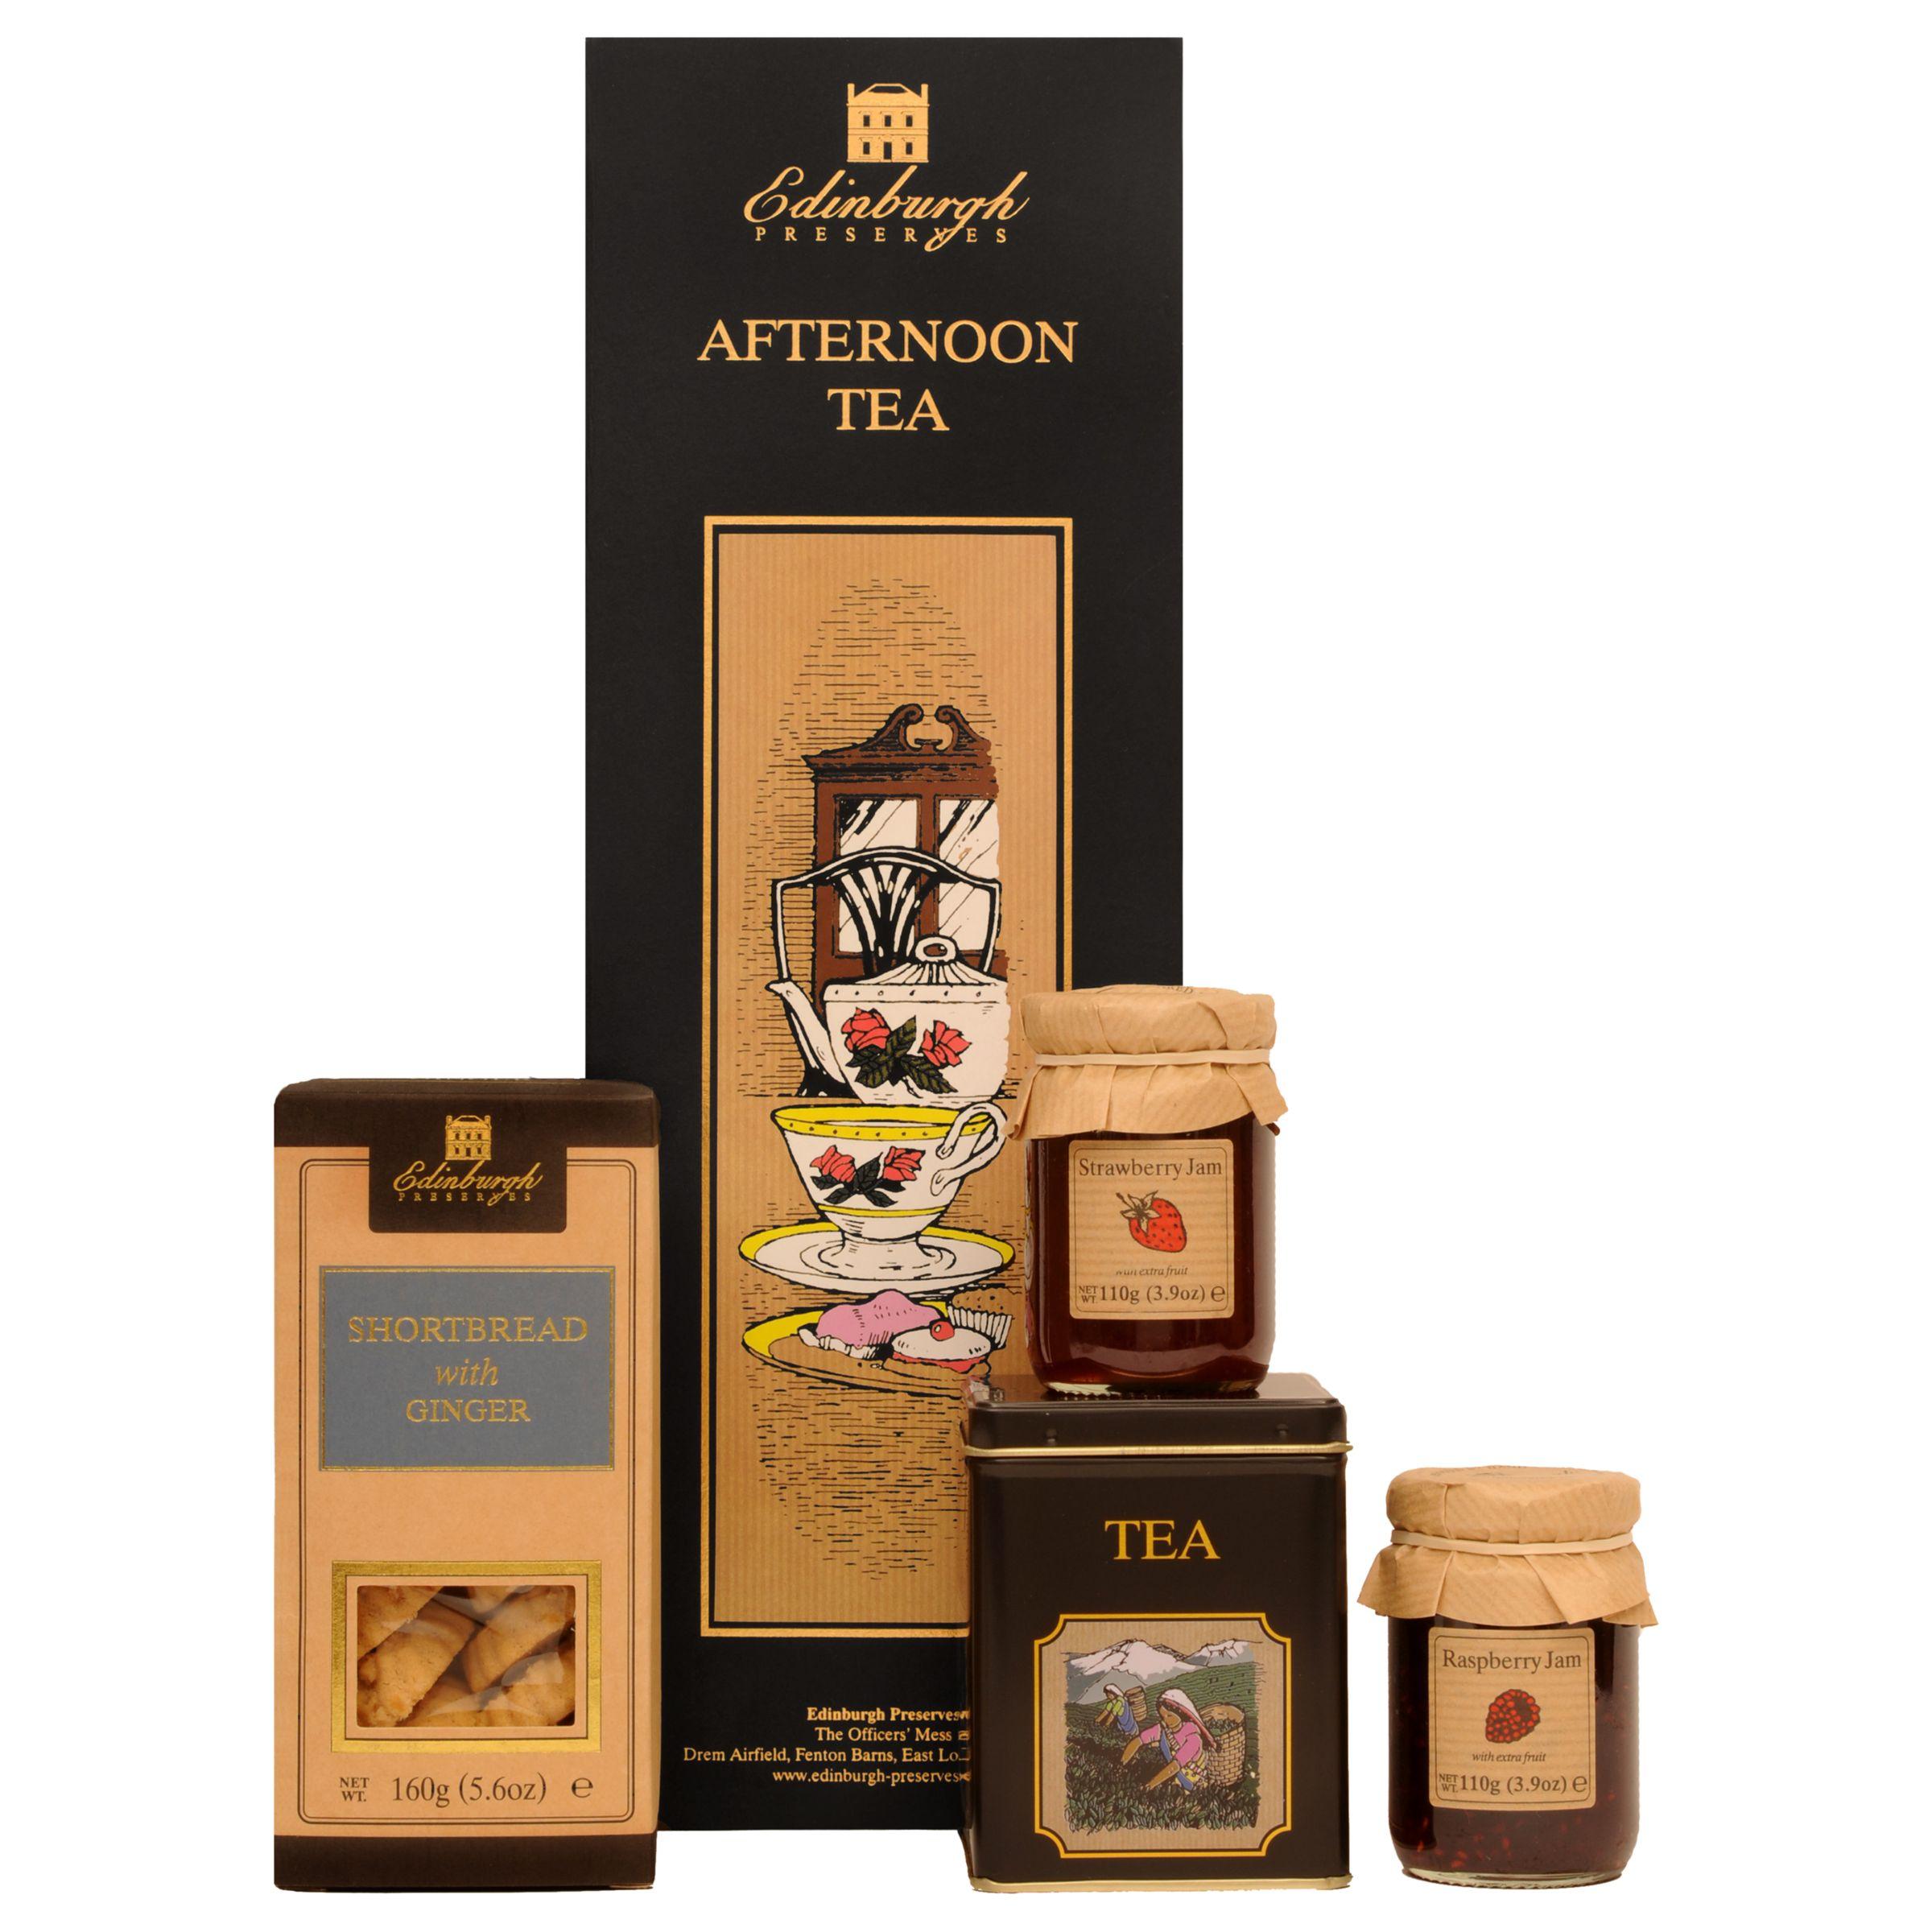 Edinburgh Preserves Afternoon Tea Gift Set At John Lewis Partners